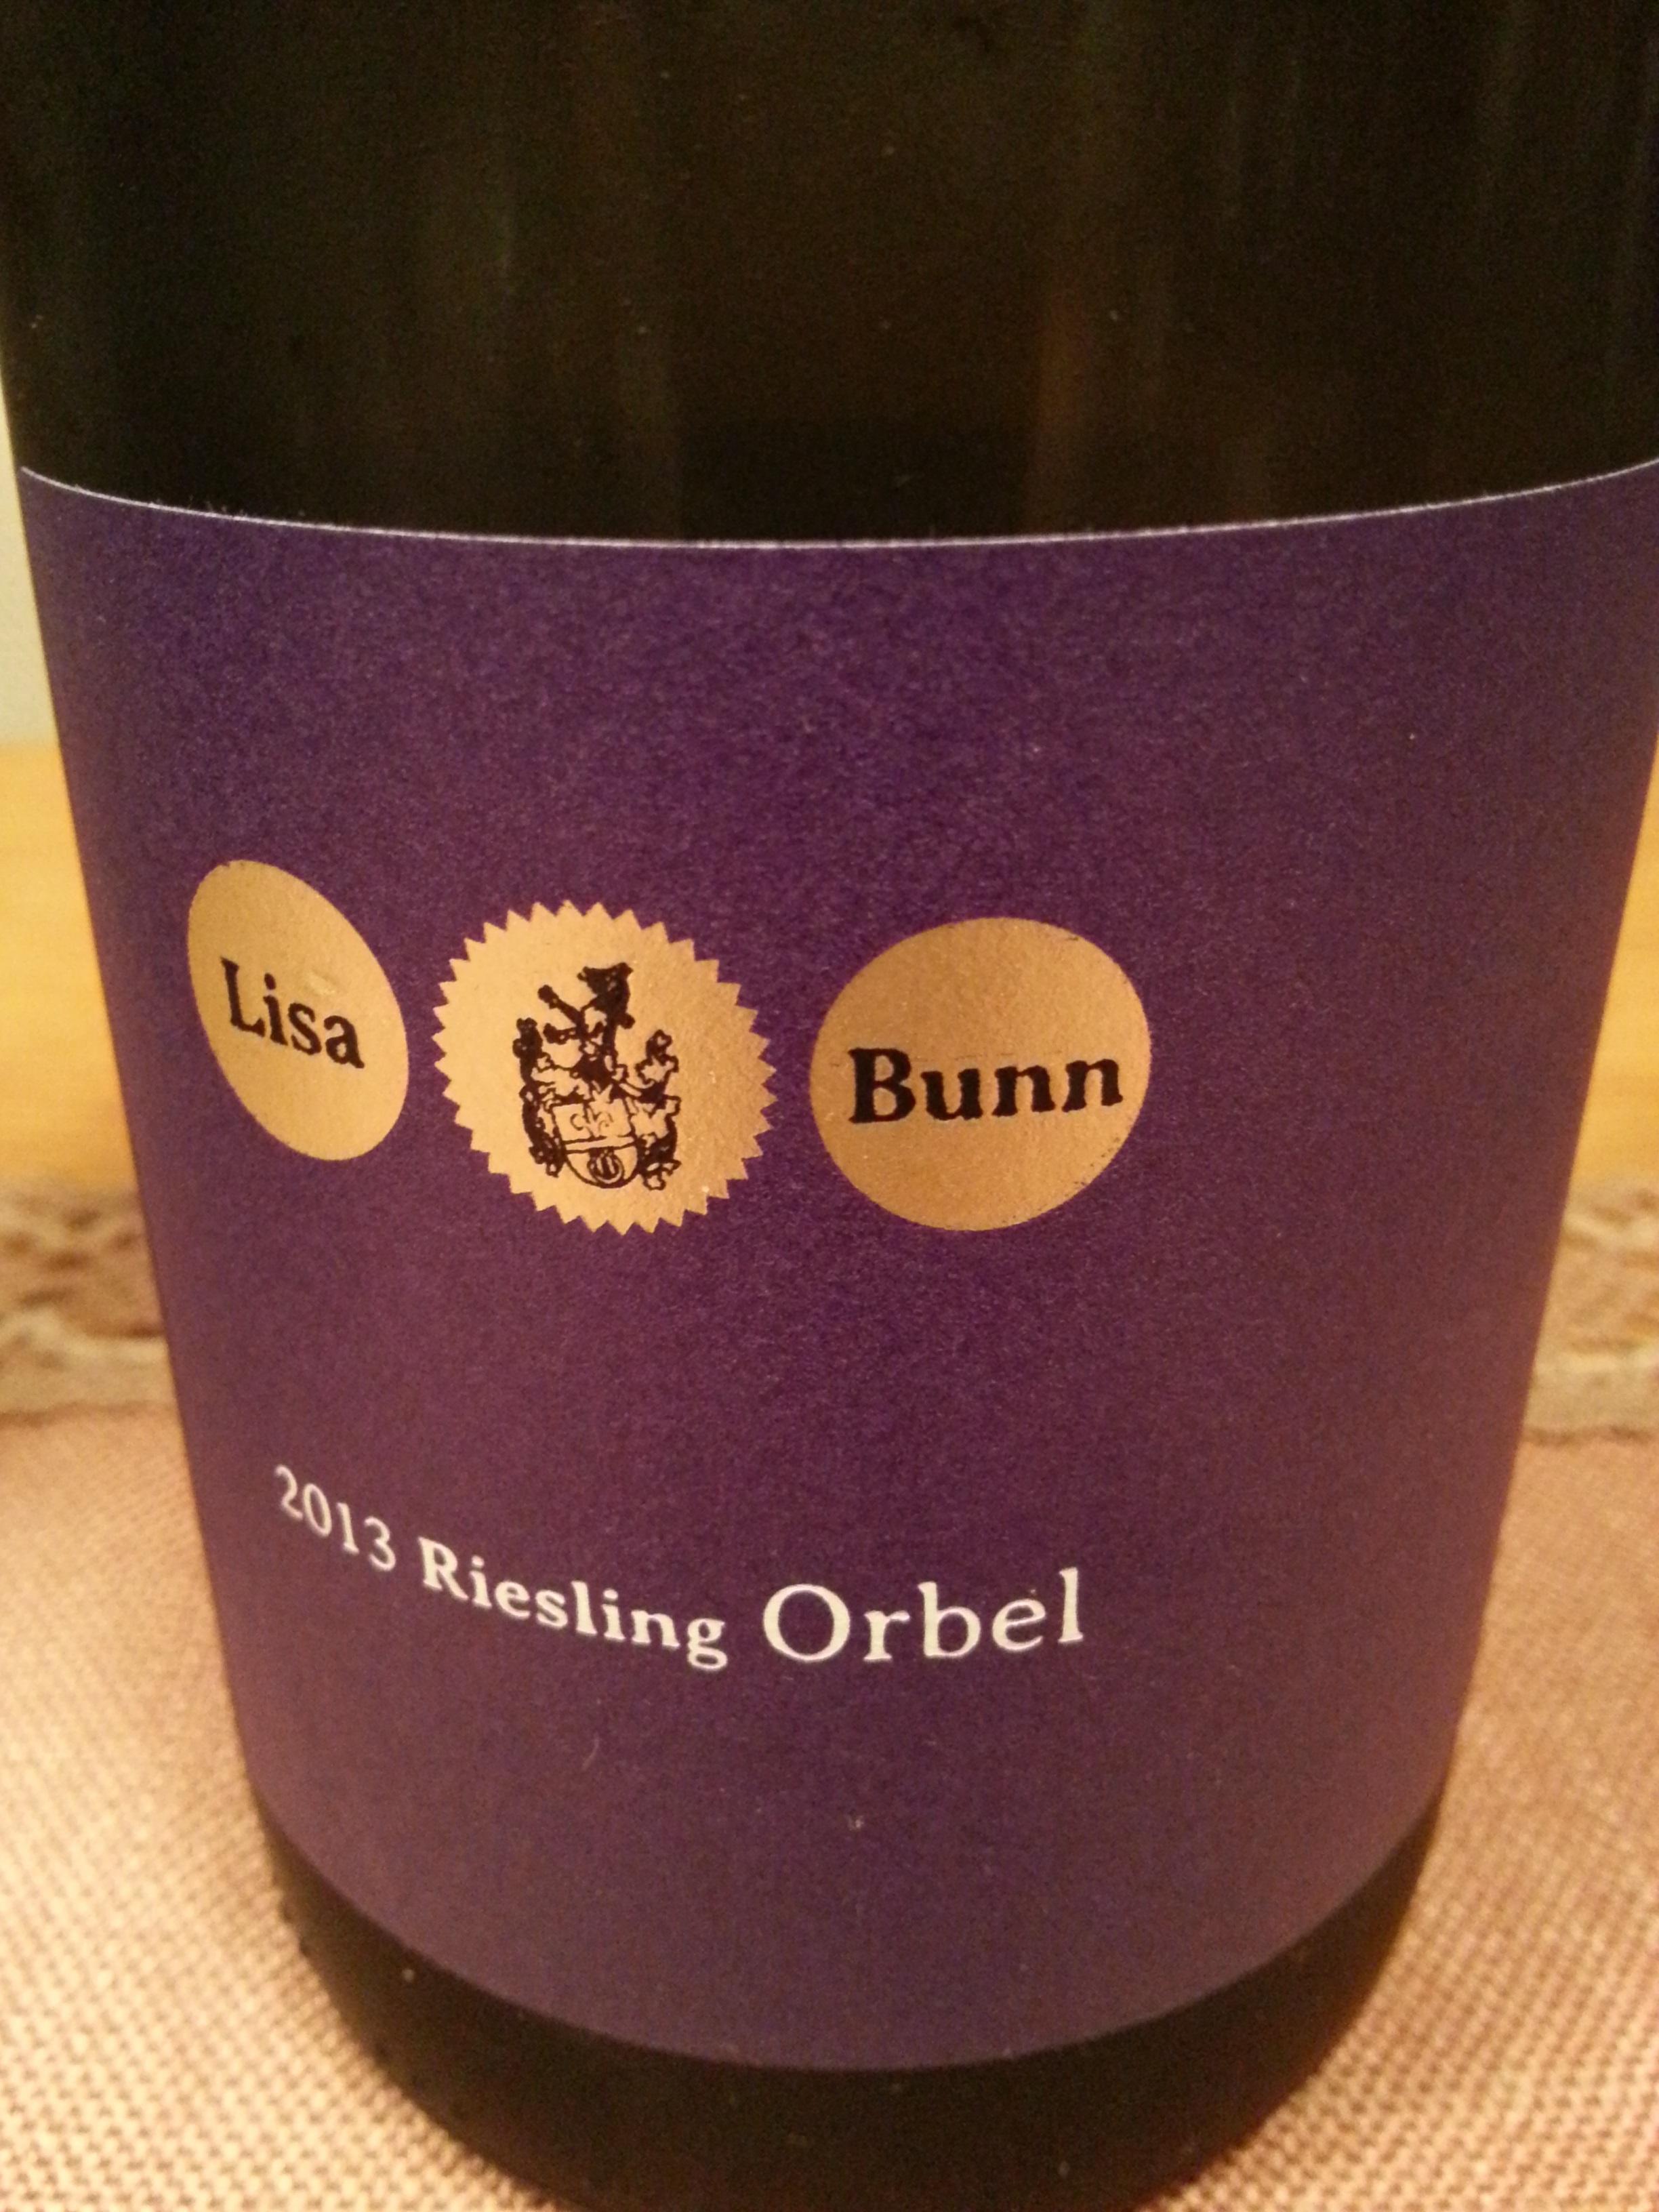 2013 Riesling Orbel | Bunn